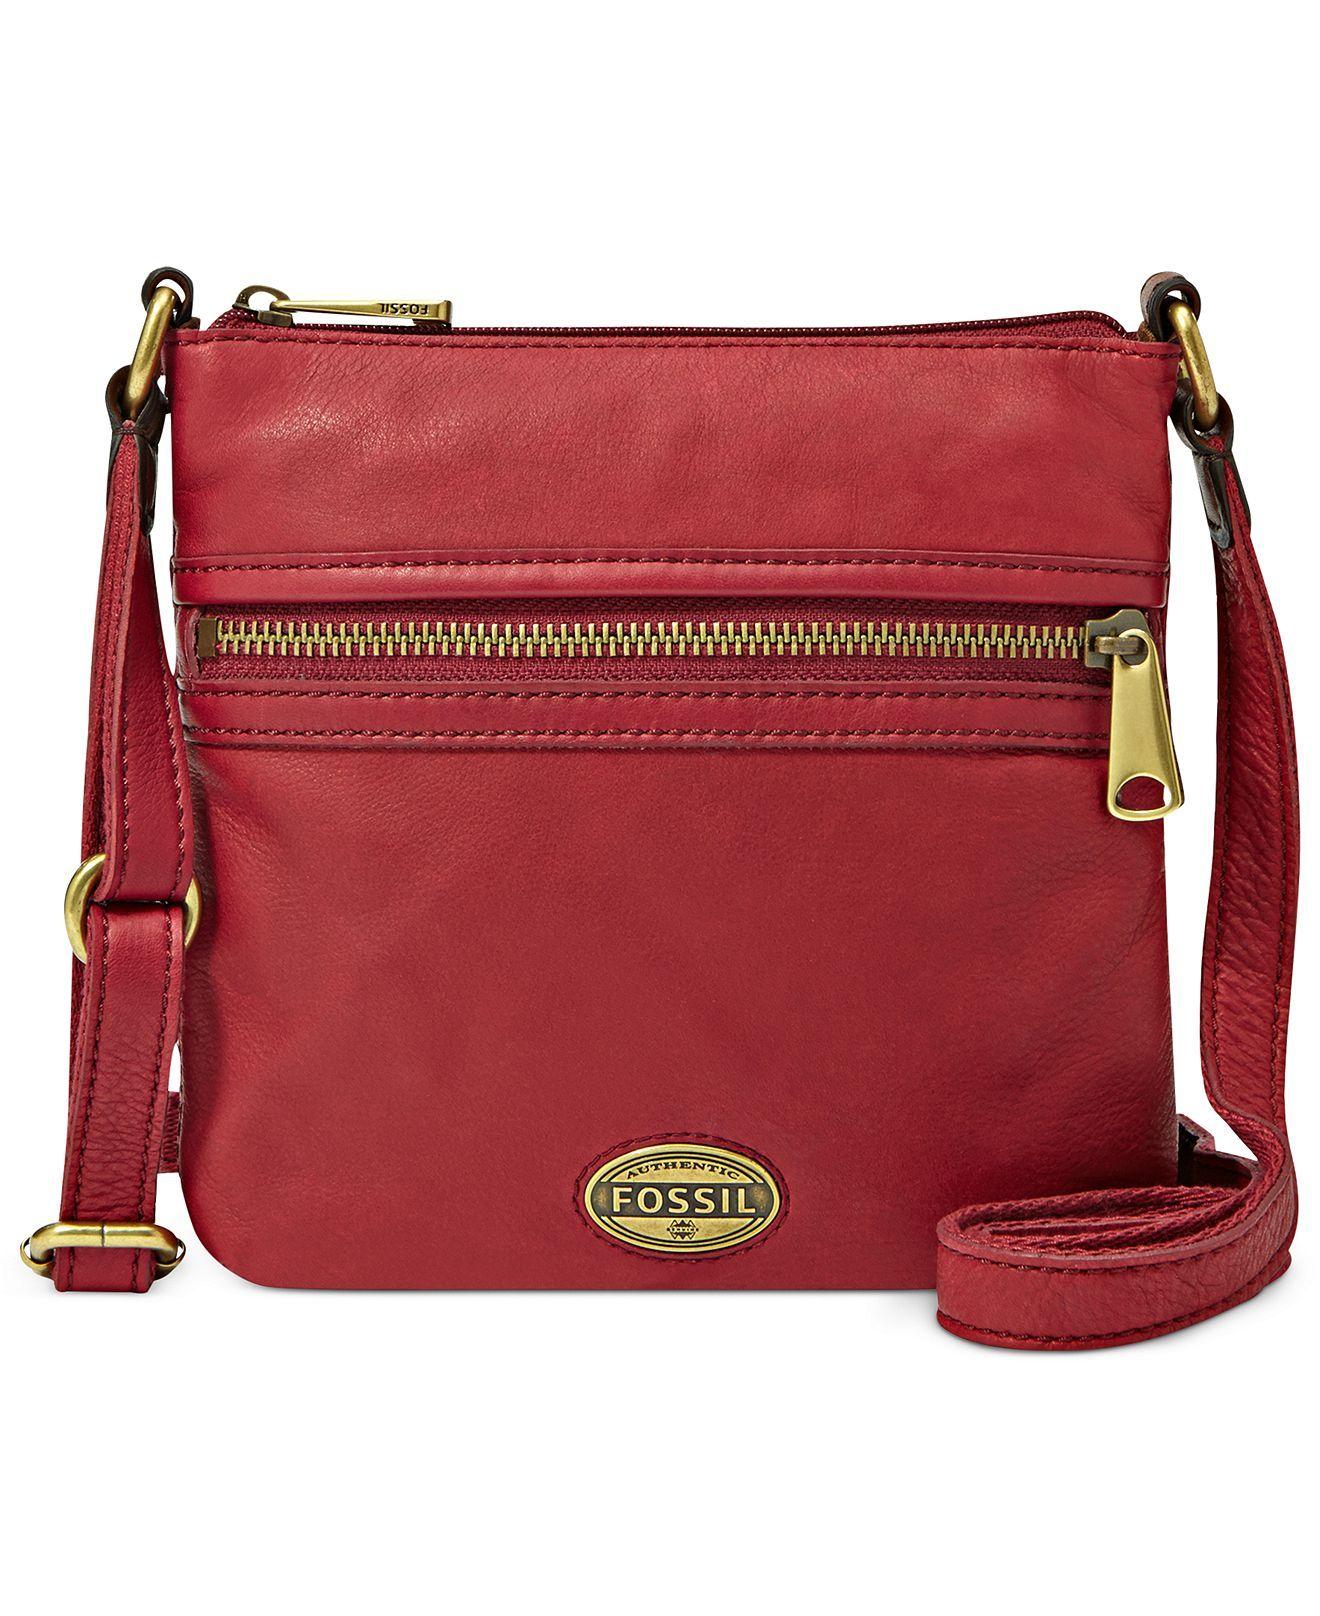 Fossil Handbag Explorer Leather Mini Crossbody